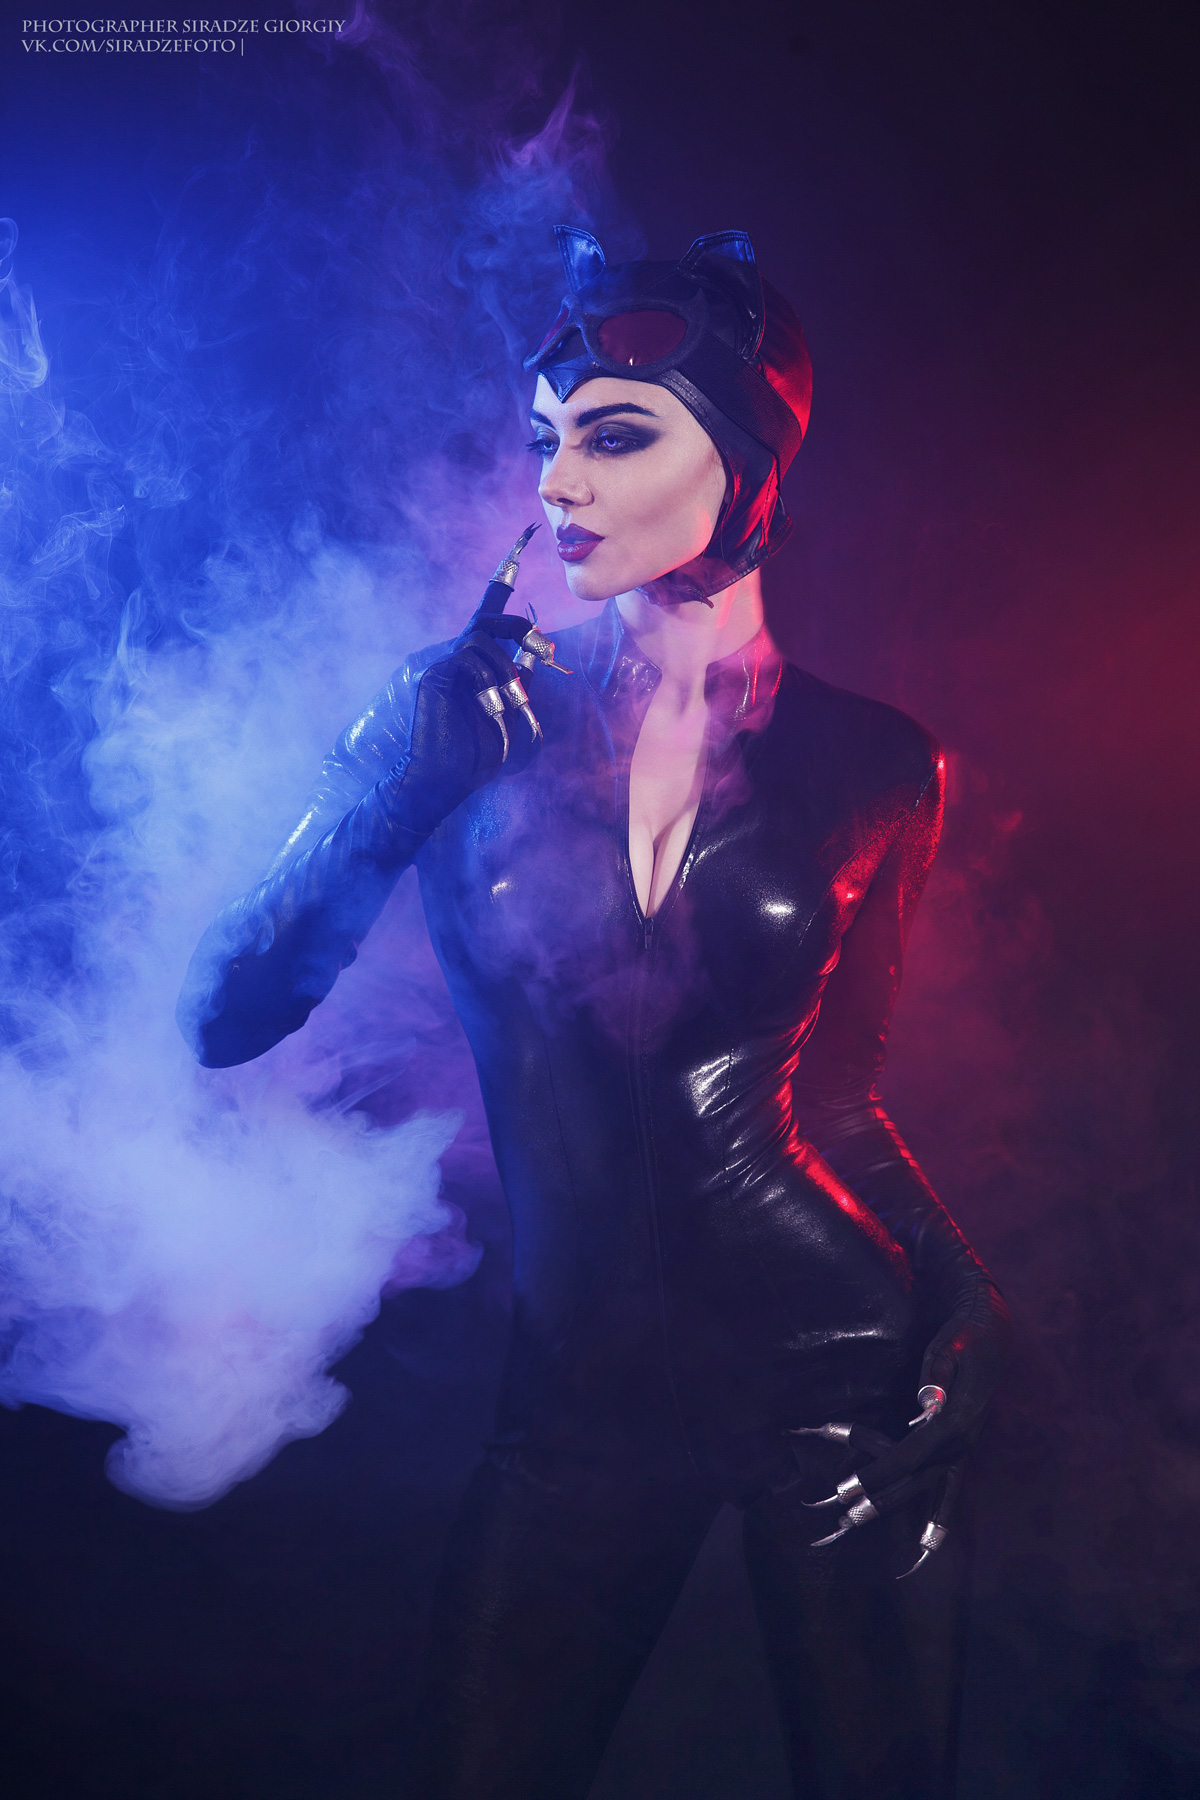 DC Comics - Catwoman by Siradze